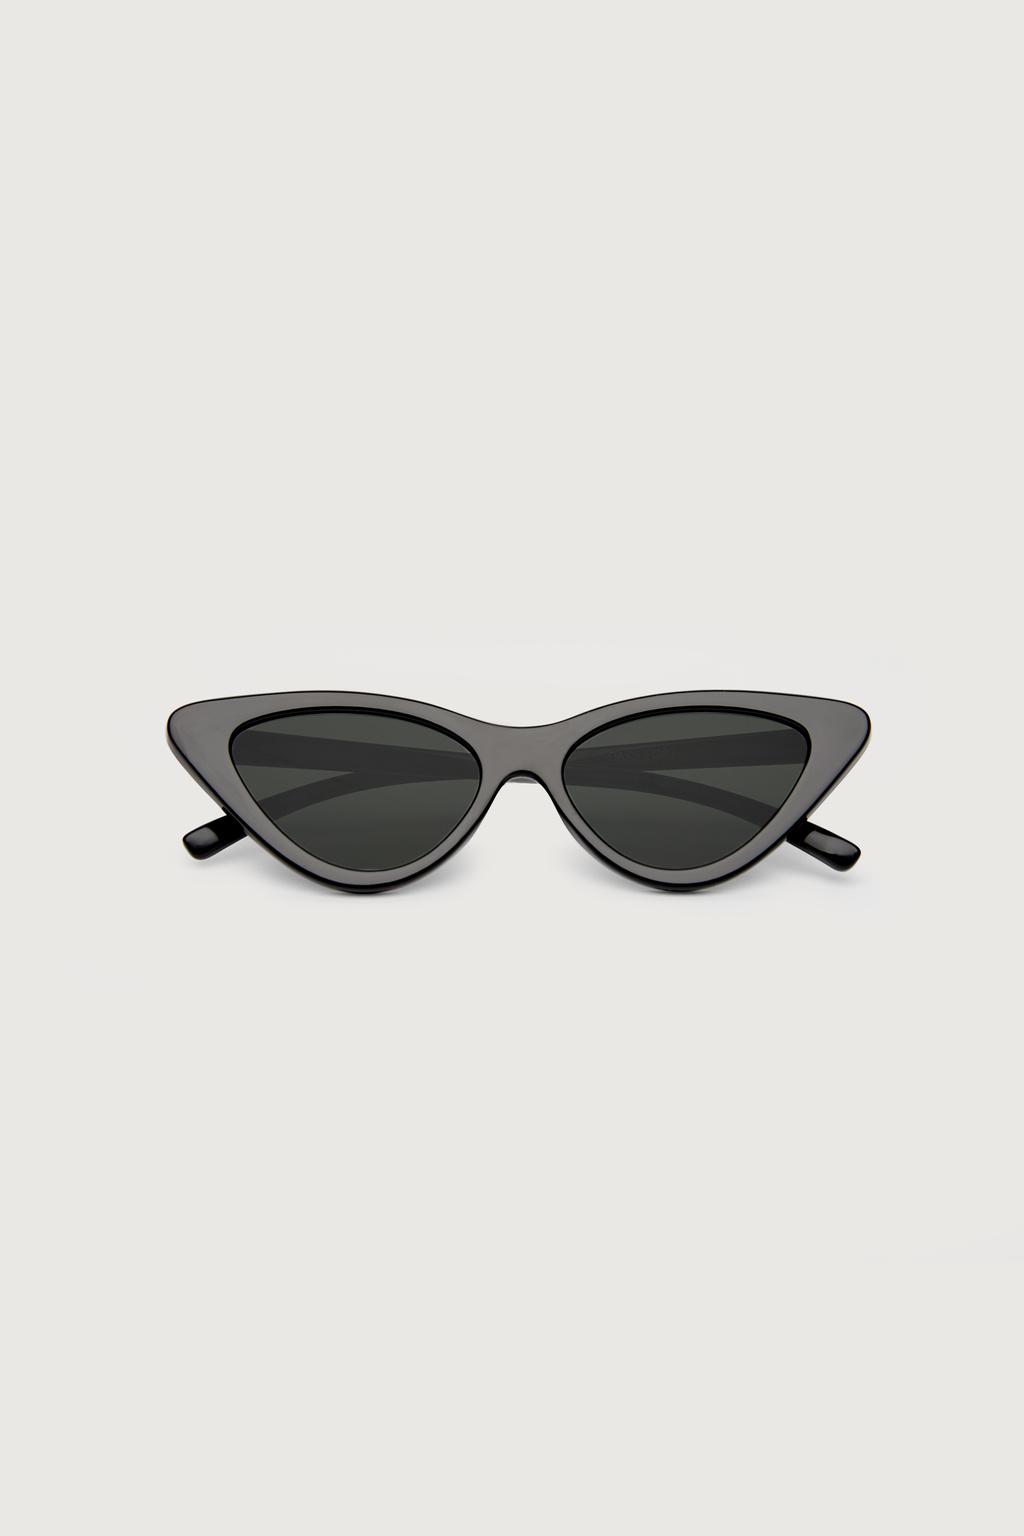 Cat-Eye: Sunglass 3369, $24, ca.oakandfort.com